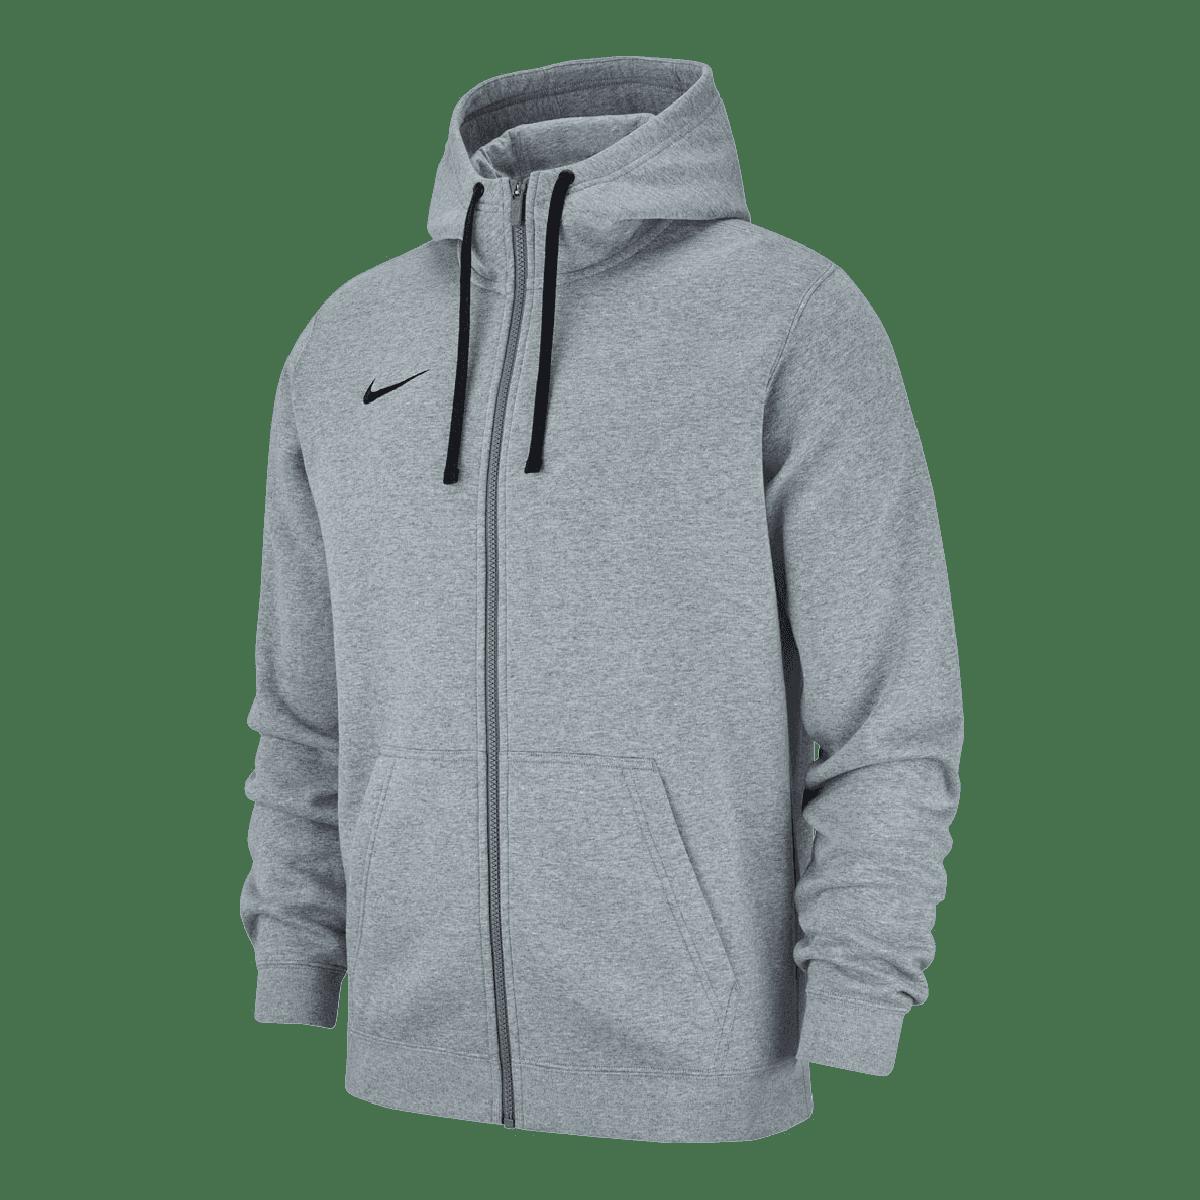 Nike Kapuzenjacke Team Club 19 Fleece Hoody hellgrauschwarz Fussball Shop